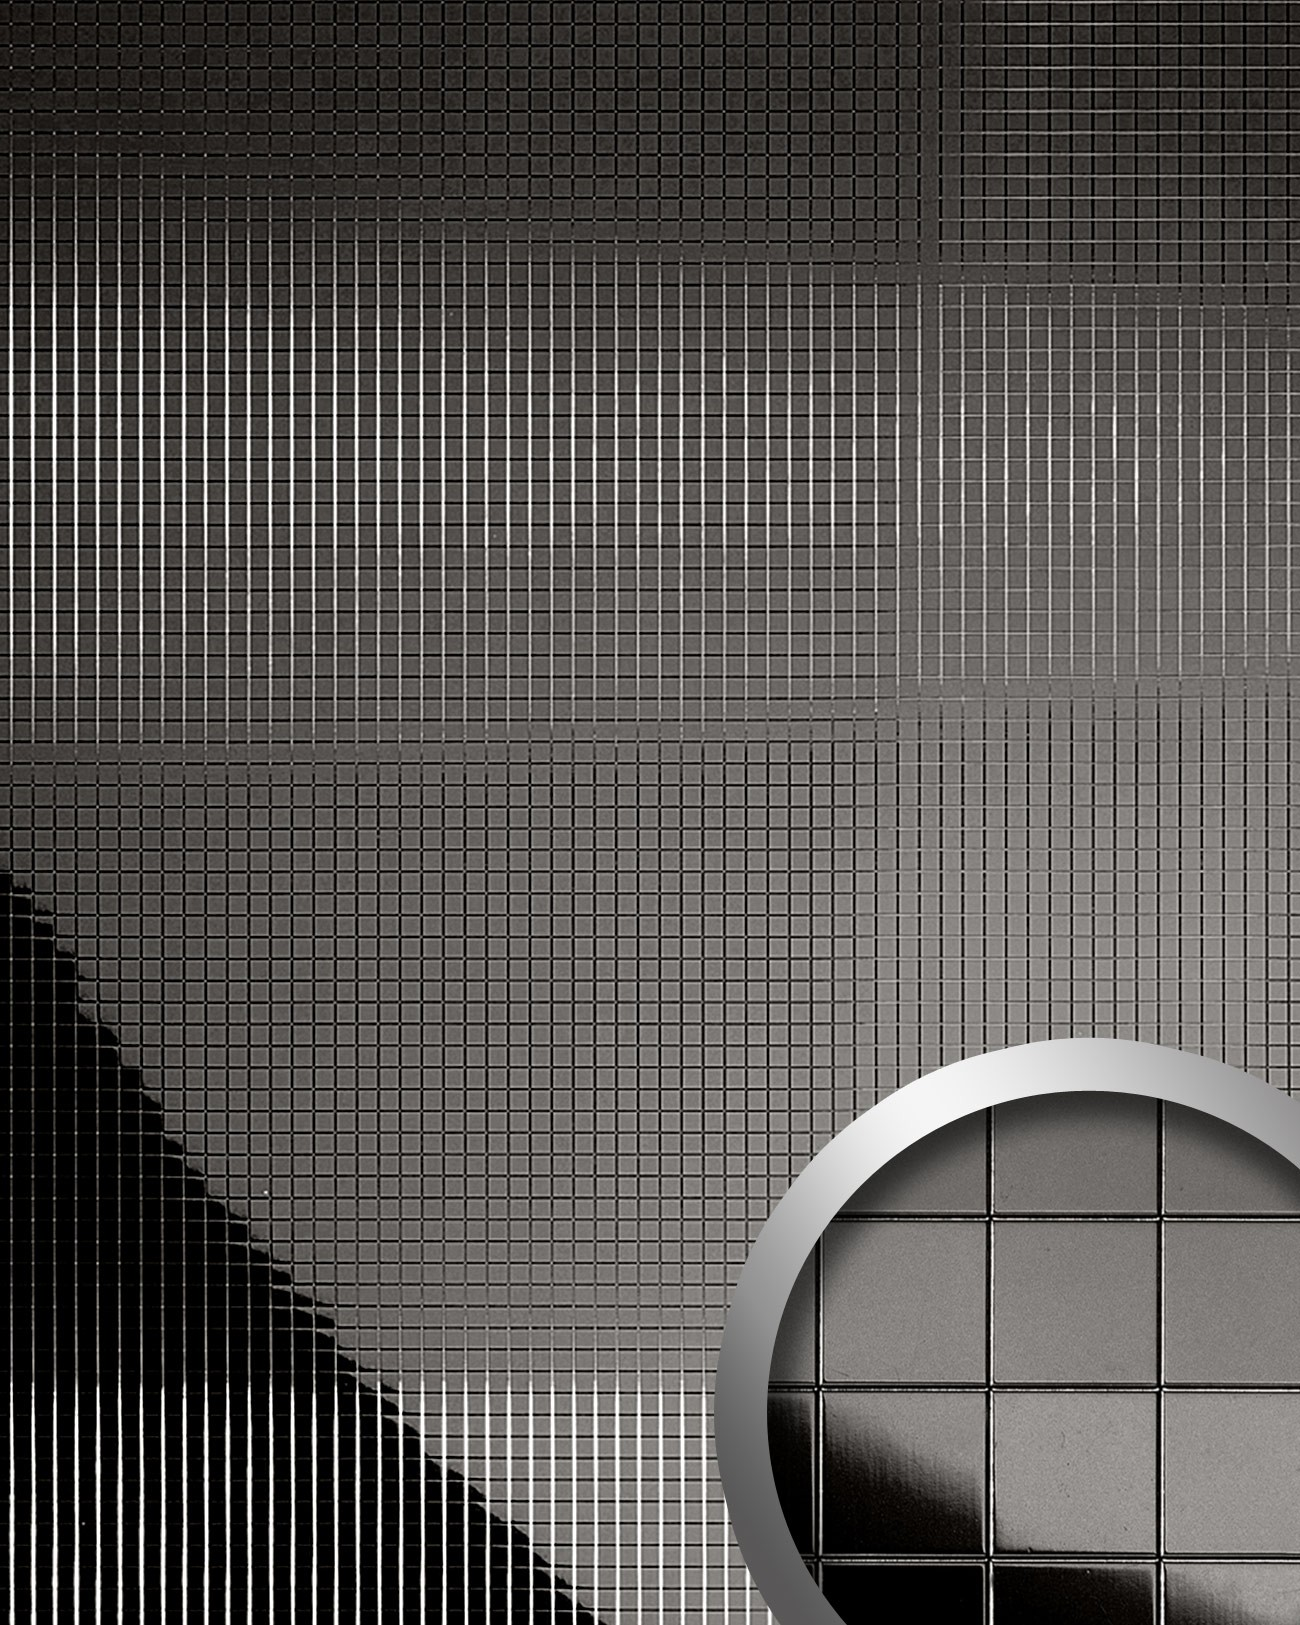 Design rev tement mural auto adh sif aimantin miroir wallface 10533 m style e - Panneaux muraux decoratifs design ...